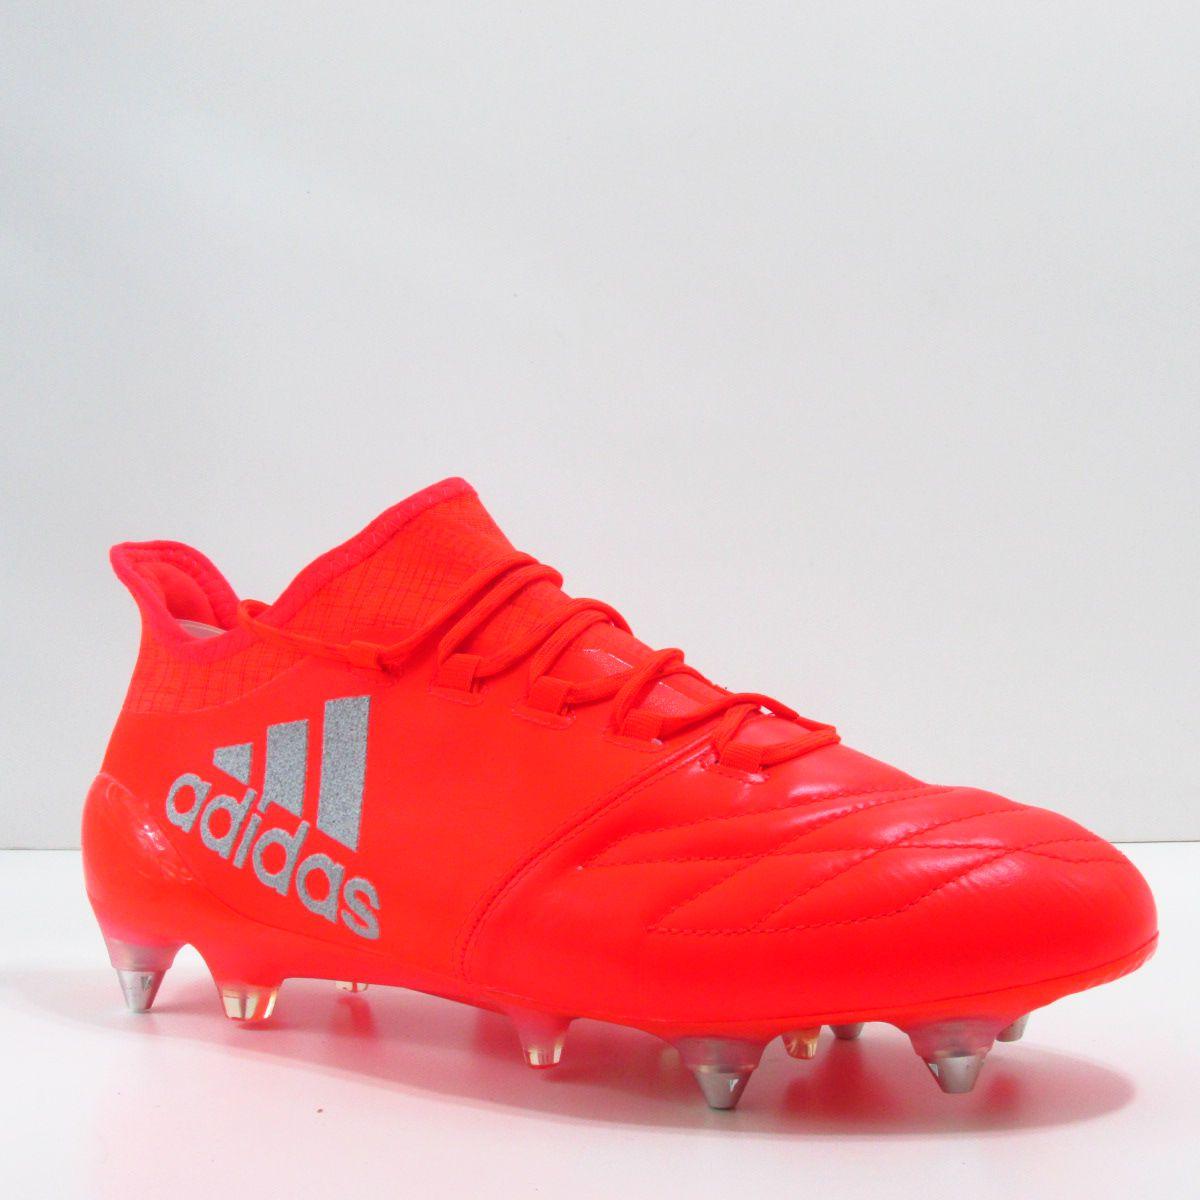 Chuteira Adidas X 16.1 SG Trava Mista - Couro de Canguru